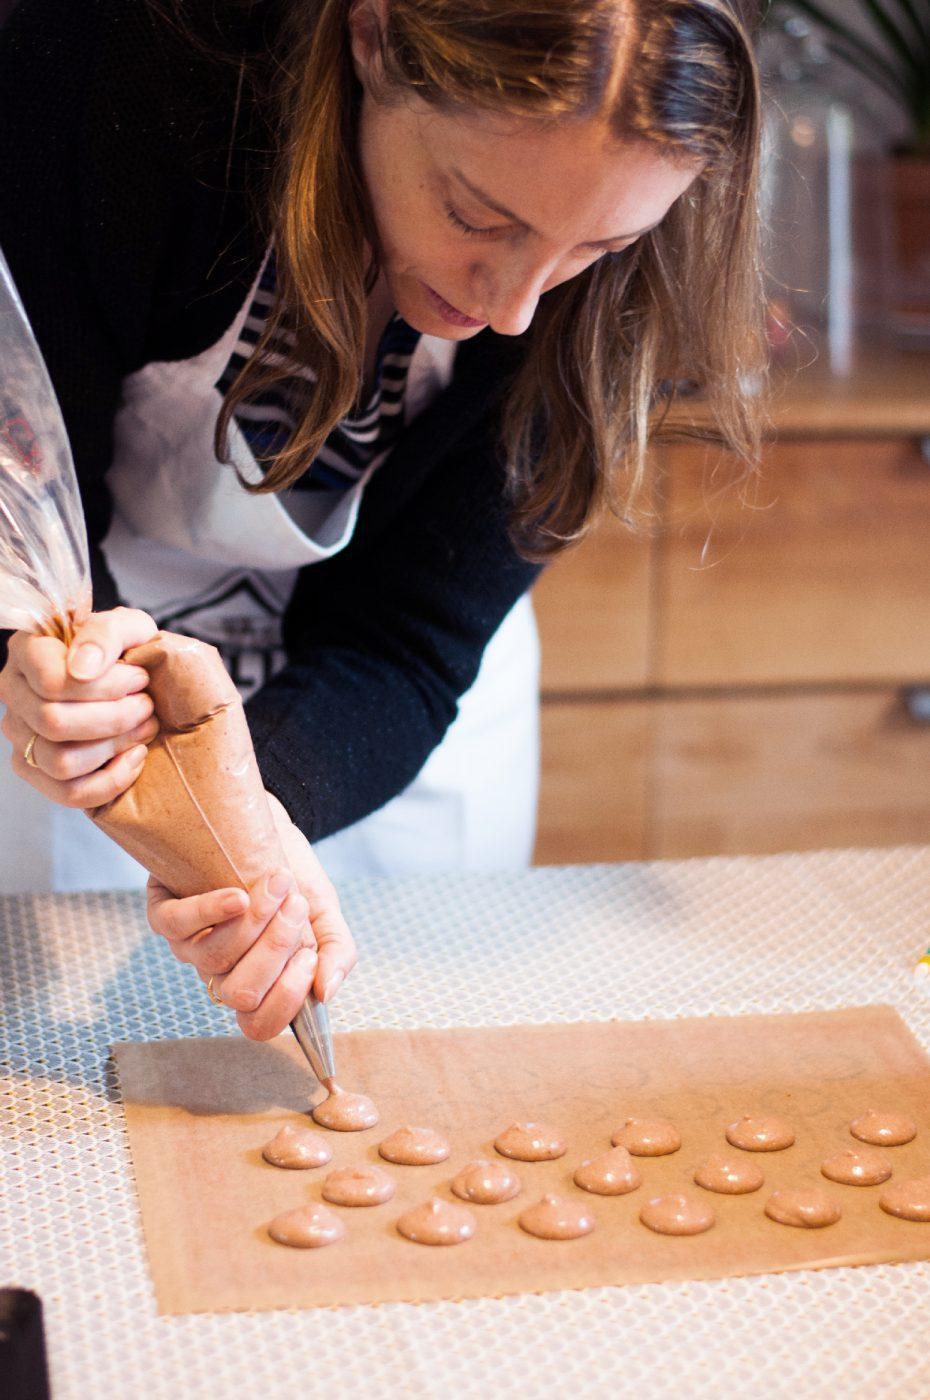 atelier-macaron-chocolat-cathy-bertrand-photographe-1-8